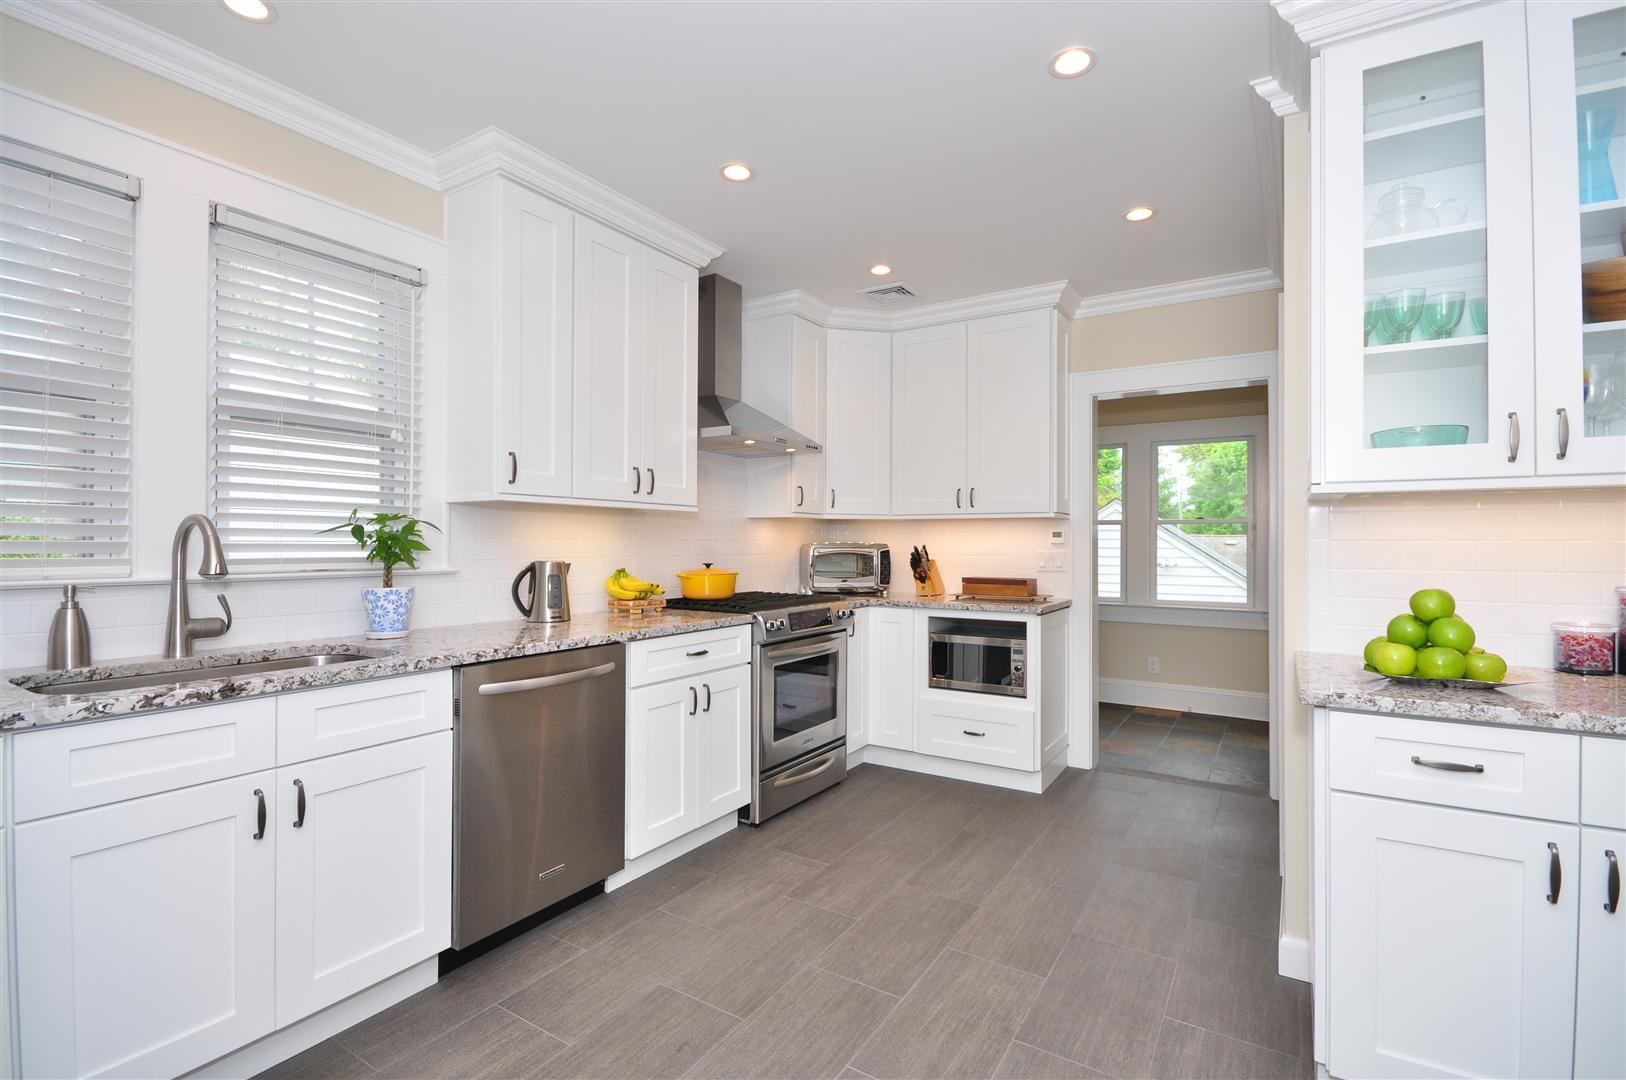 Captivating White Kitchen Cabinets